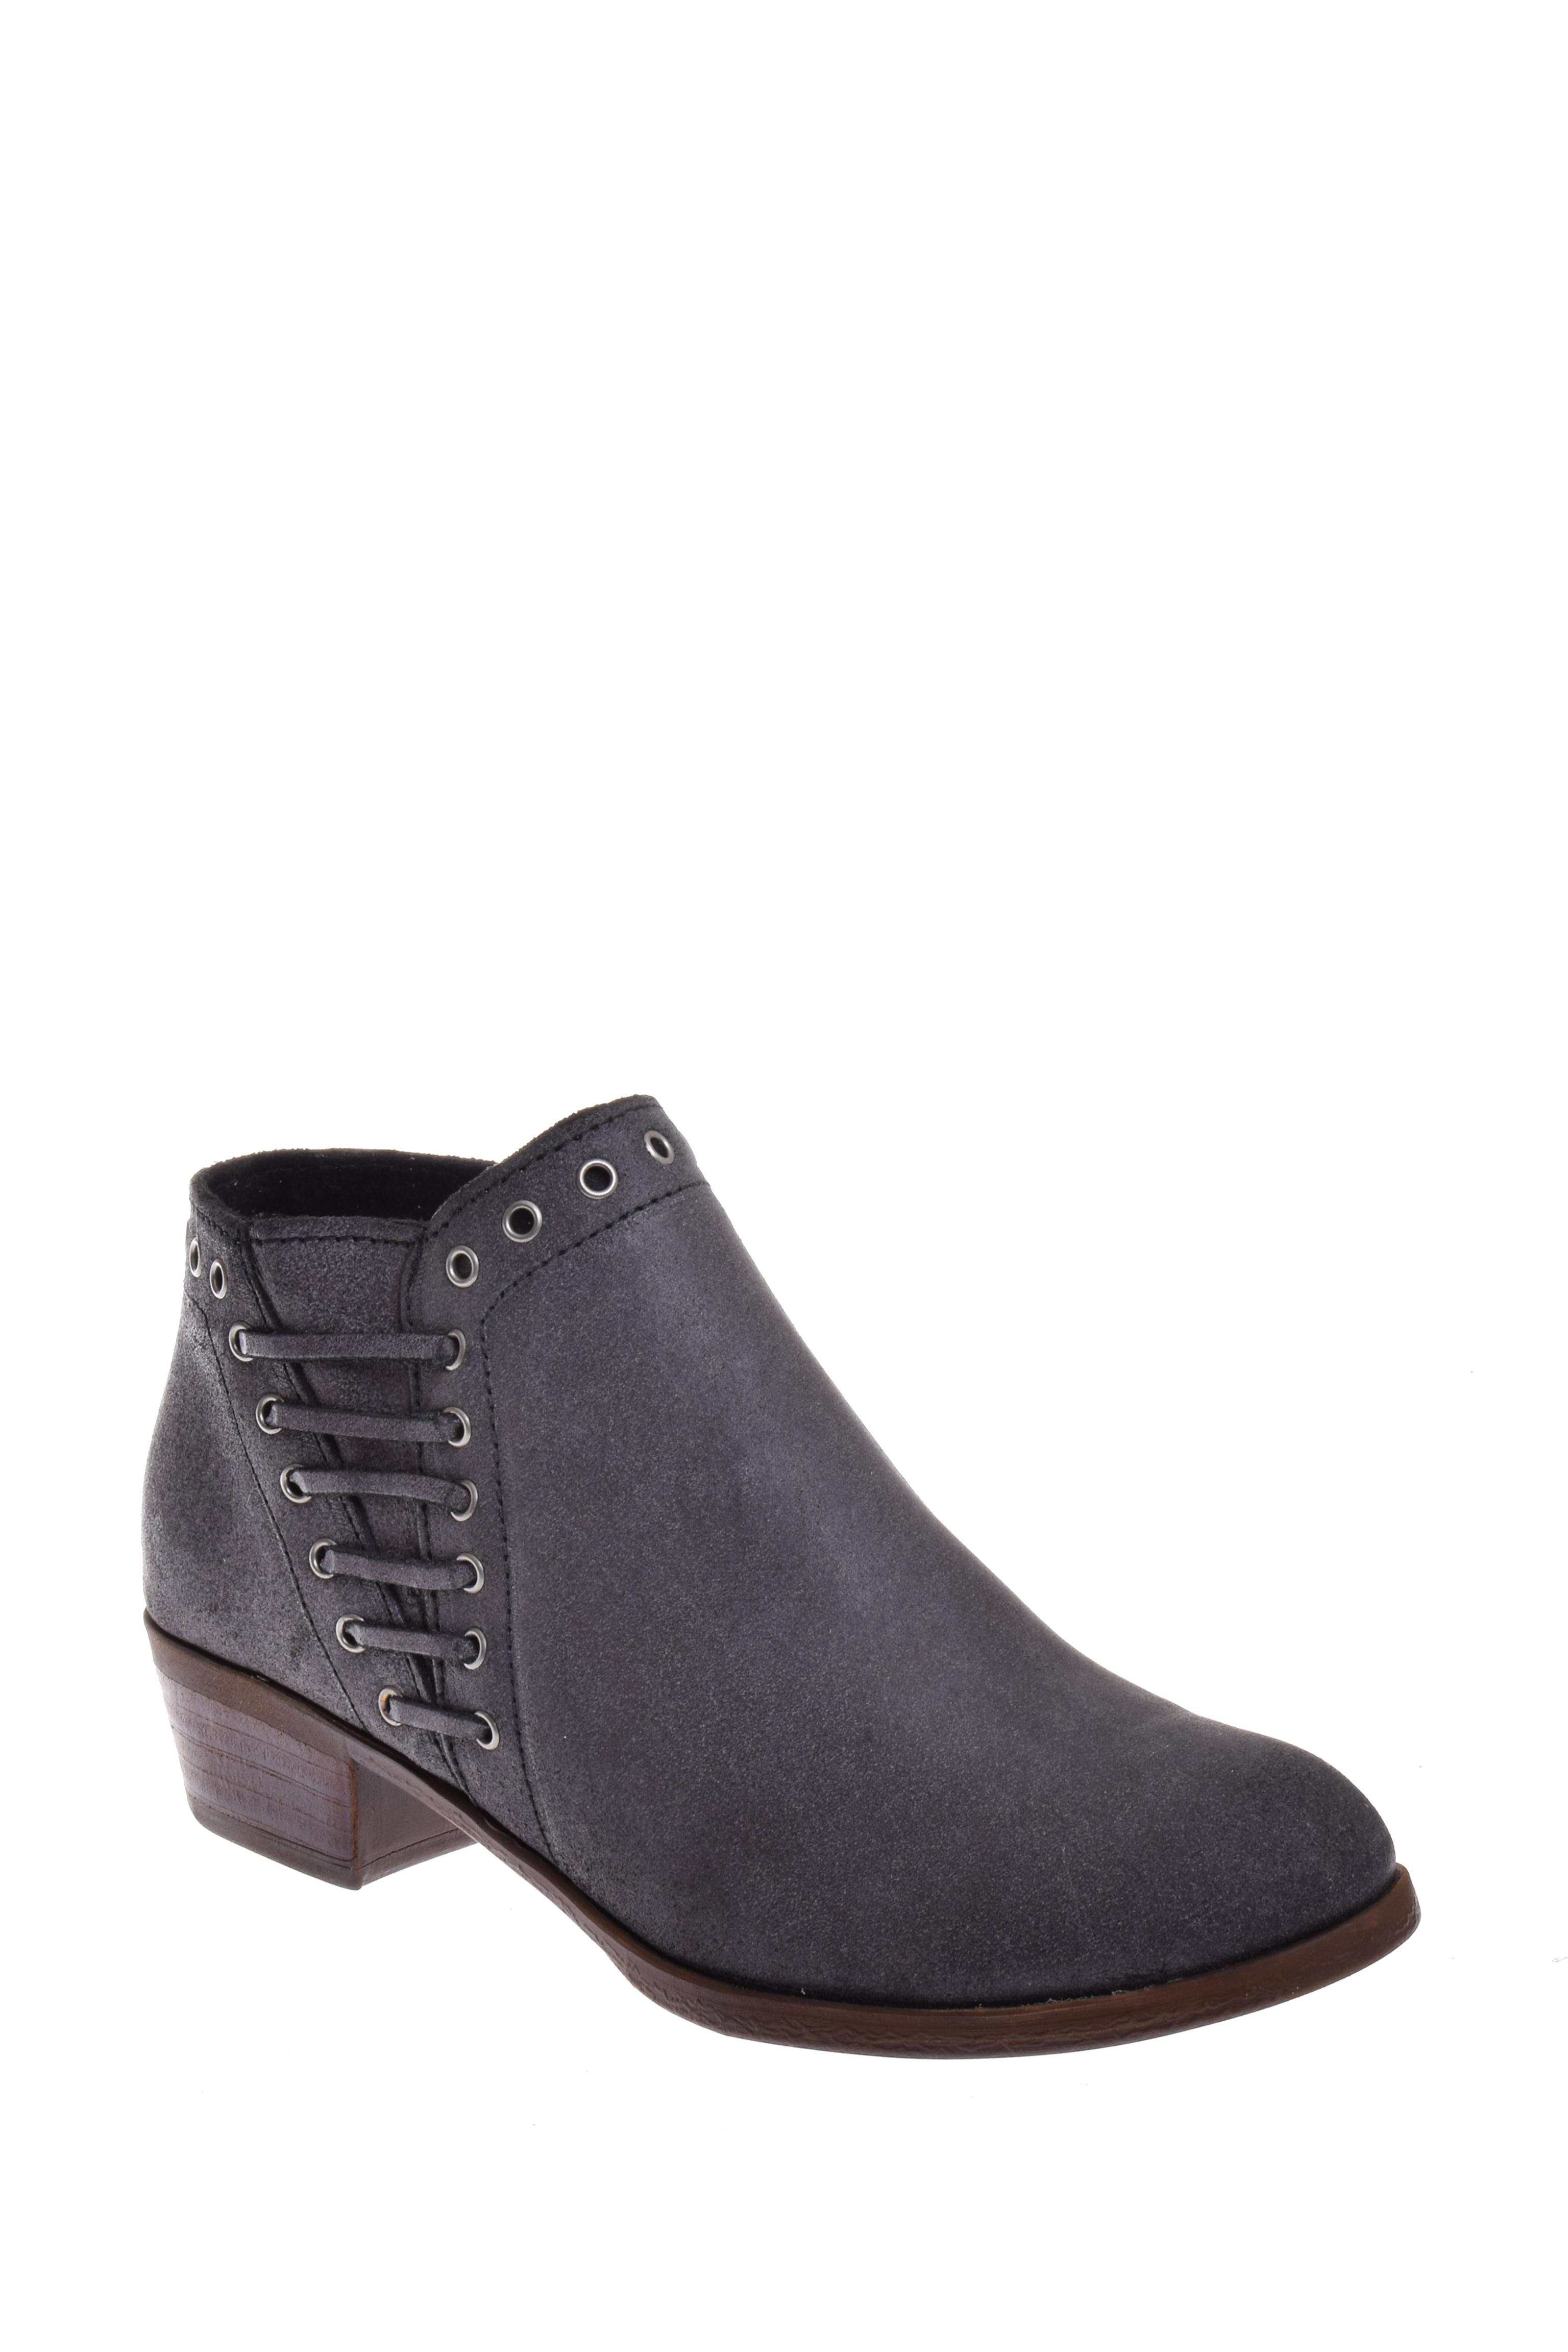 Minnetonka Brenna Low Heel Bootie Vintage Charcoal by